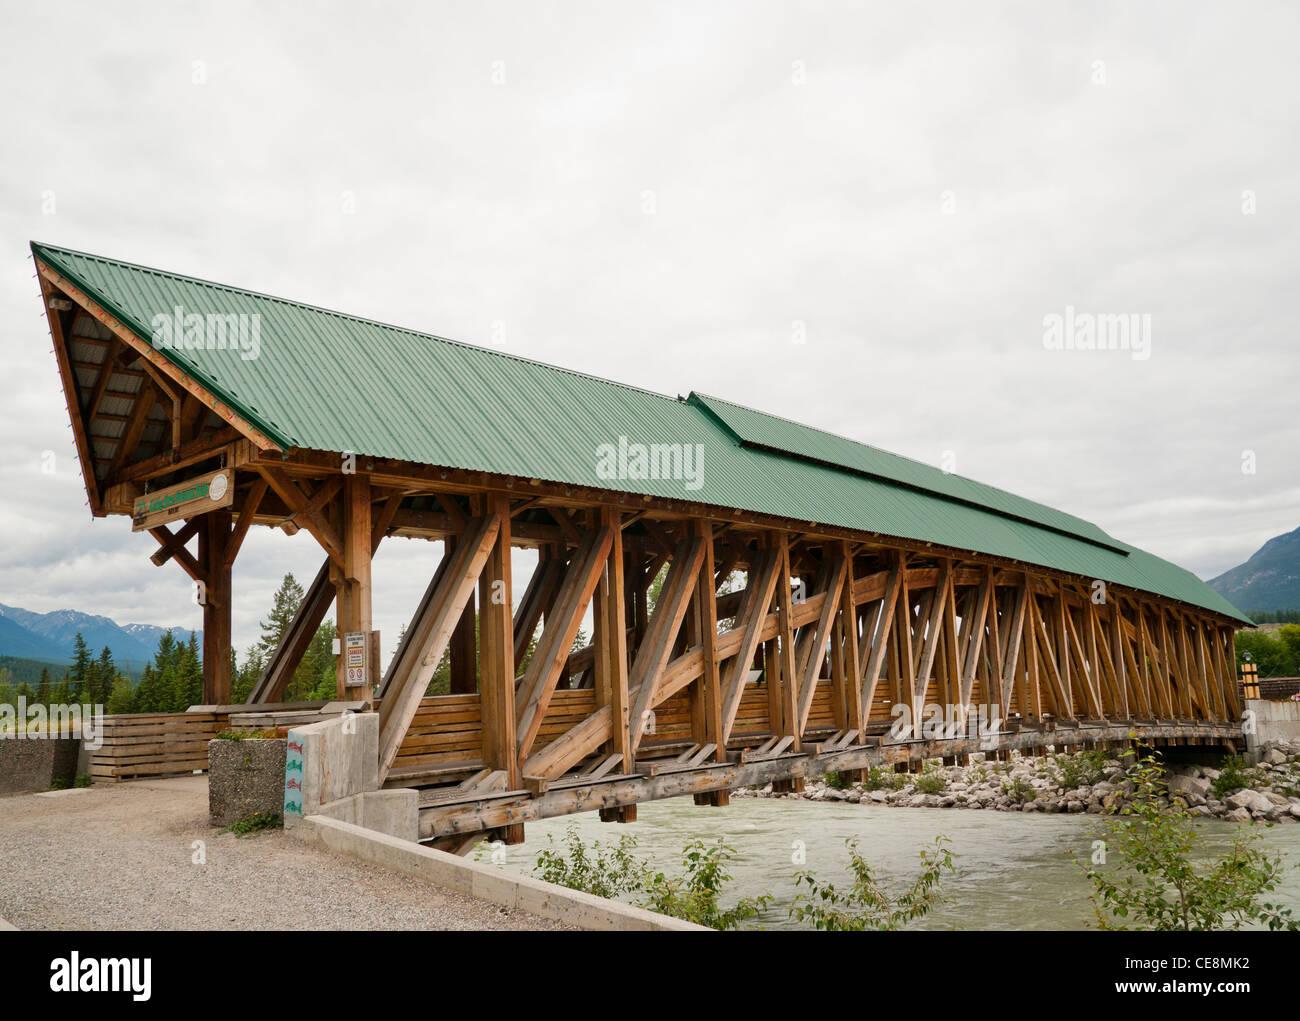 Lovely Timber Frame Bridge #9: Kicking Horse Pedestrian Bridge In Golden Is The Longest Authentic Covered Timber  Frame Bridge In Canada